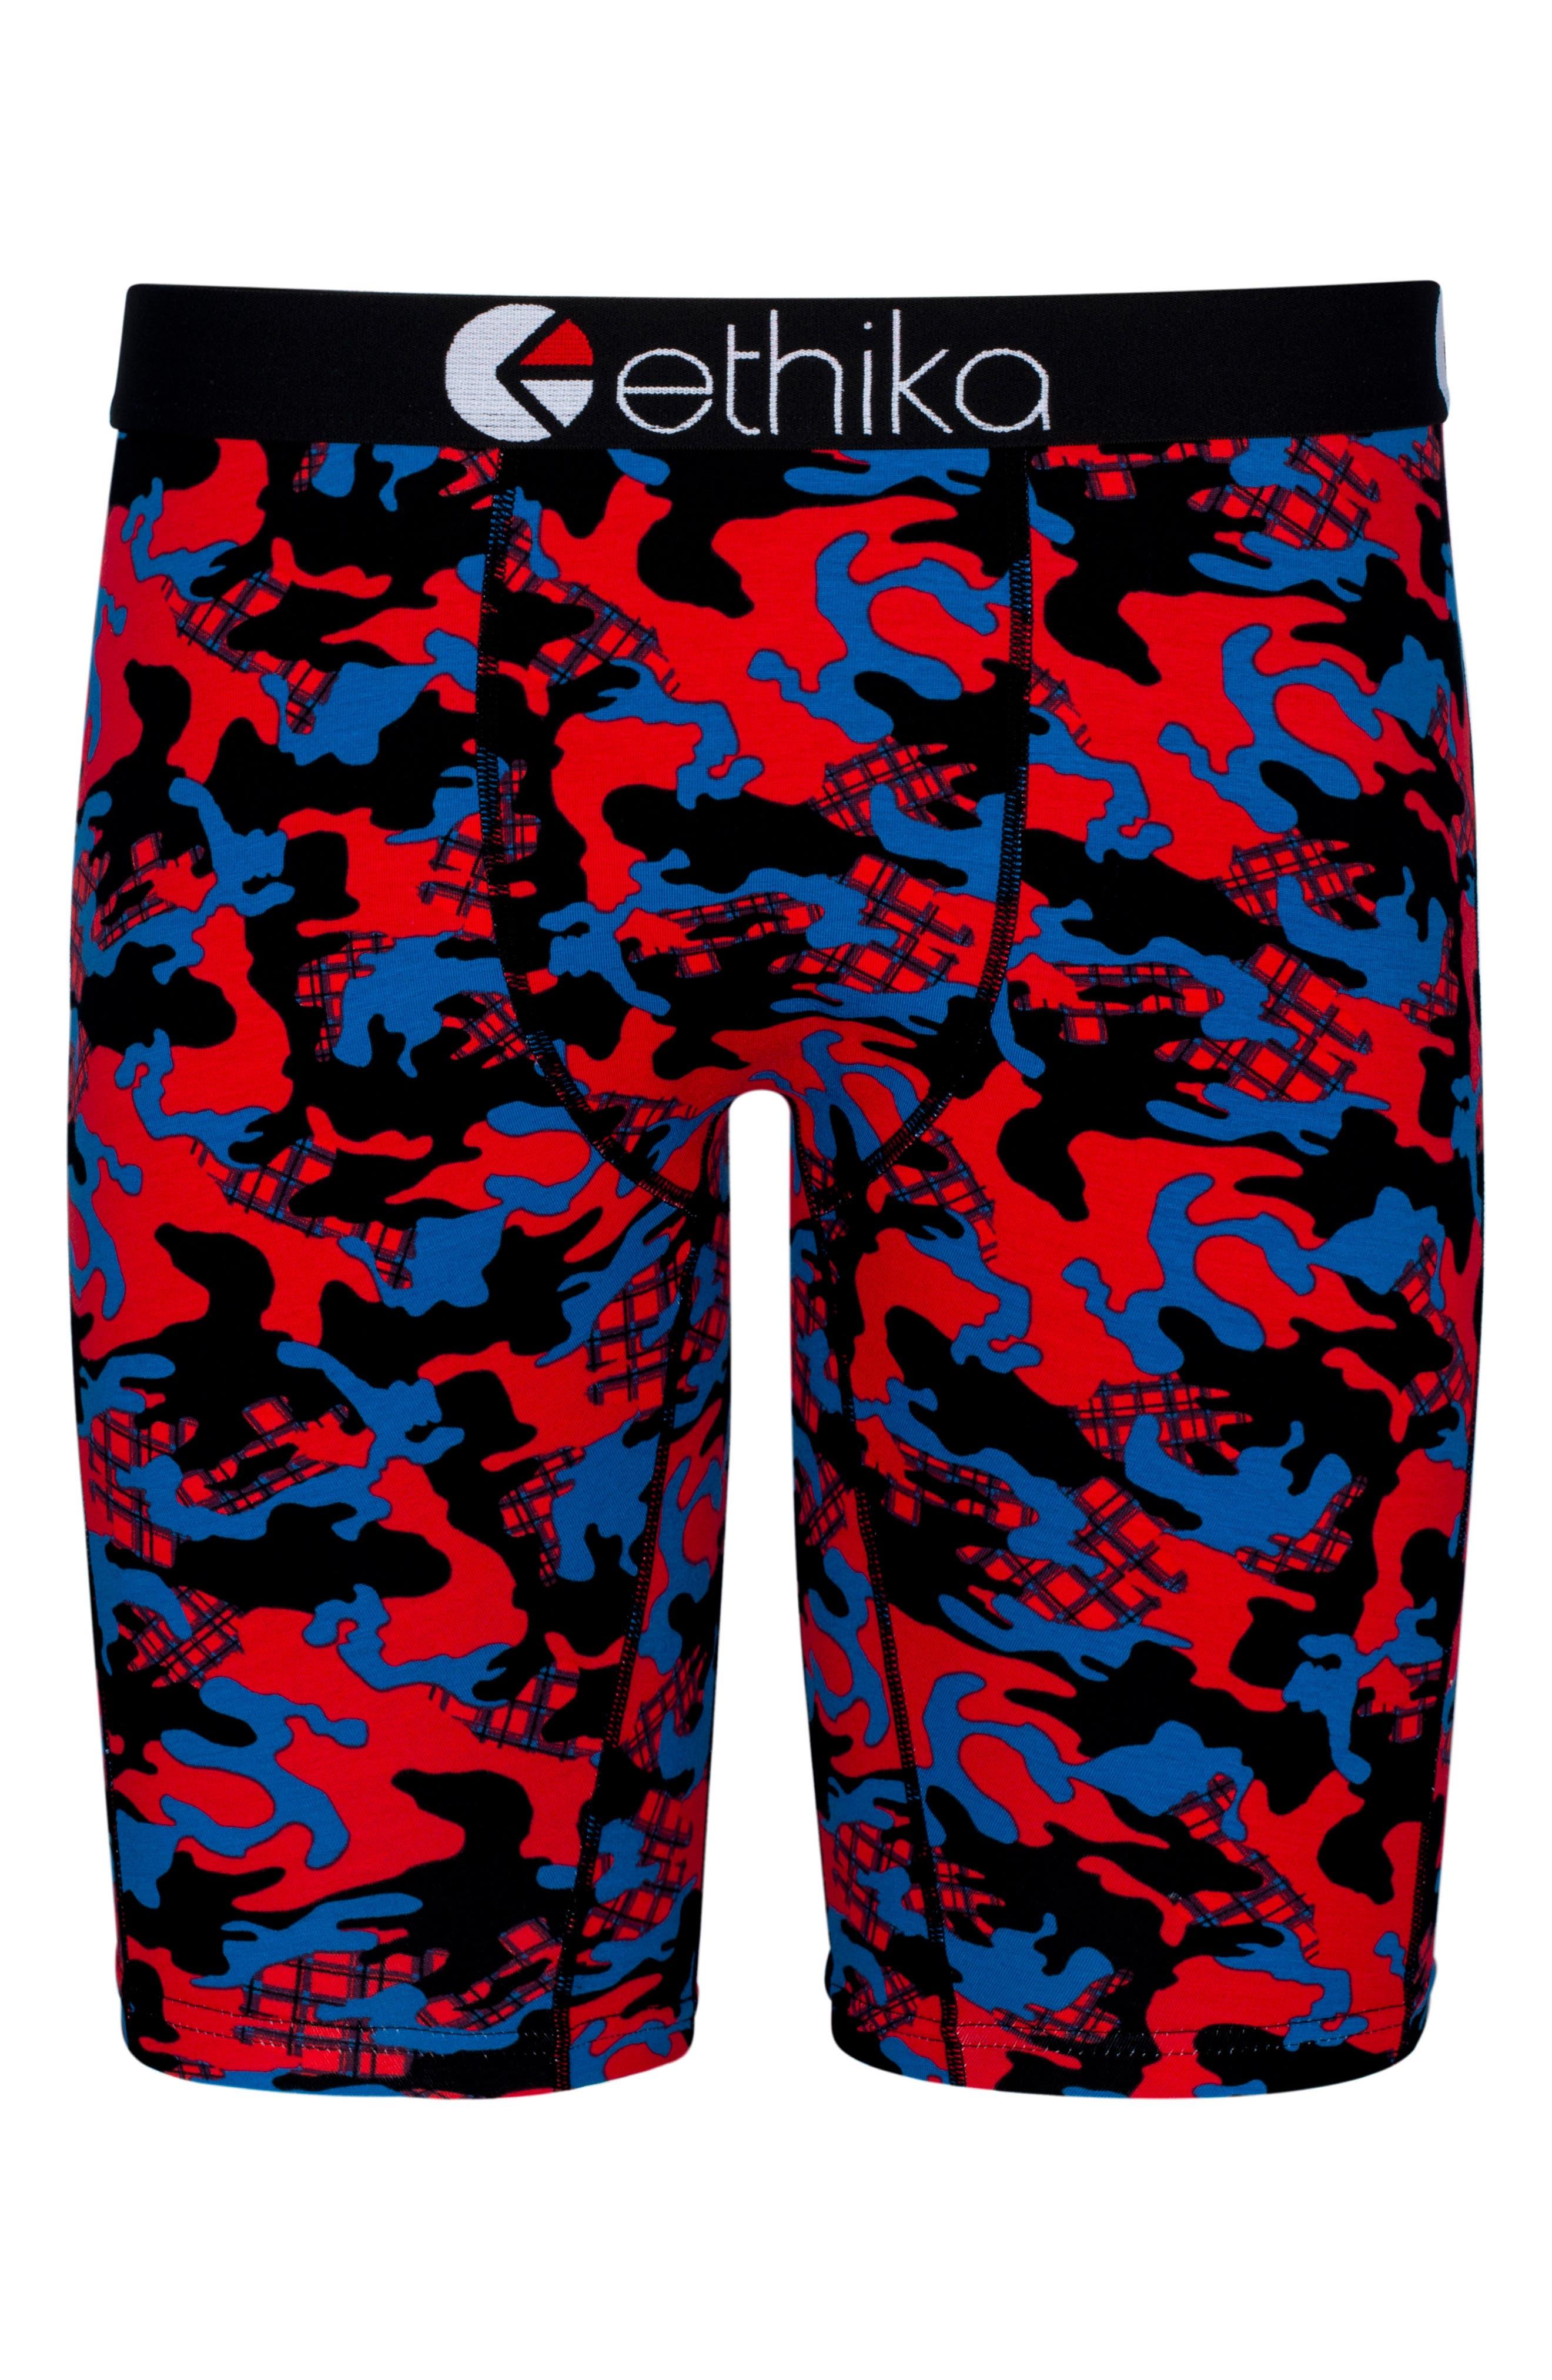 Jacks Camo Boxer Briefs,                             Main thumbnail 1, color,                             RED